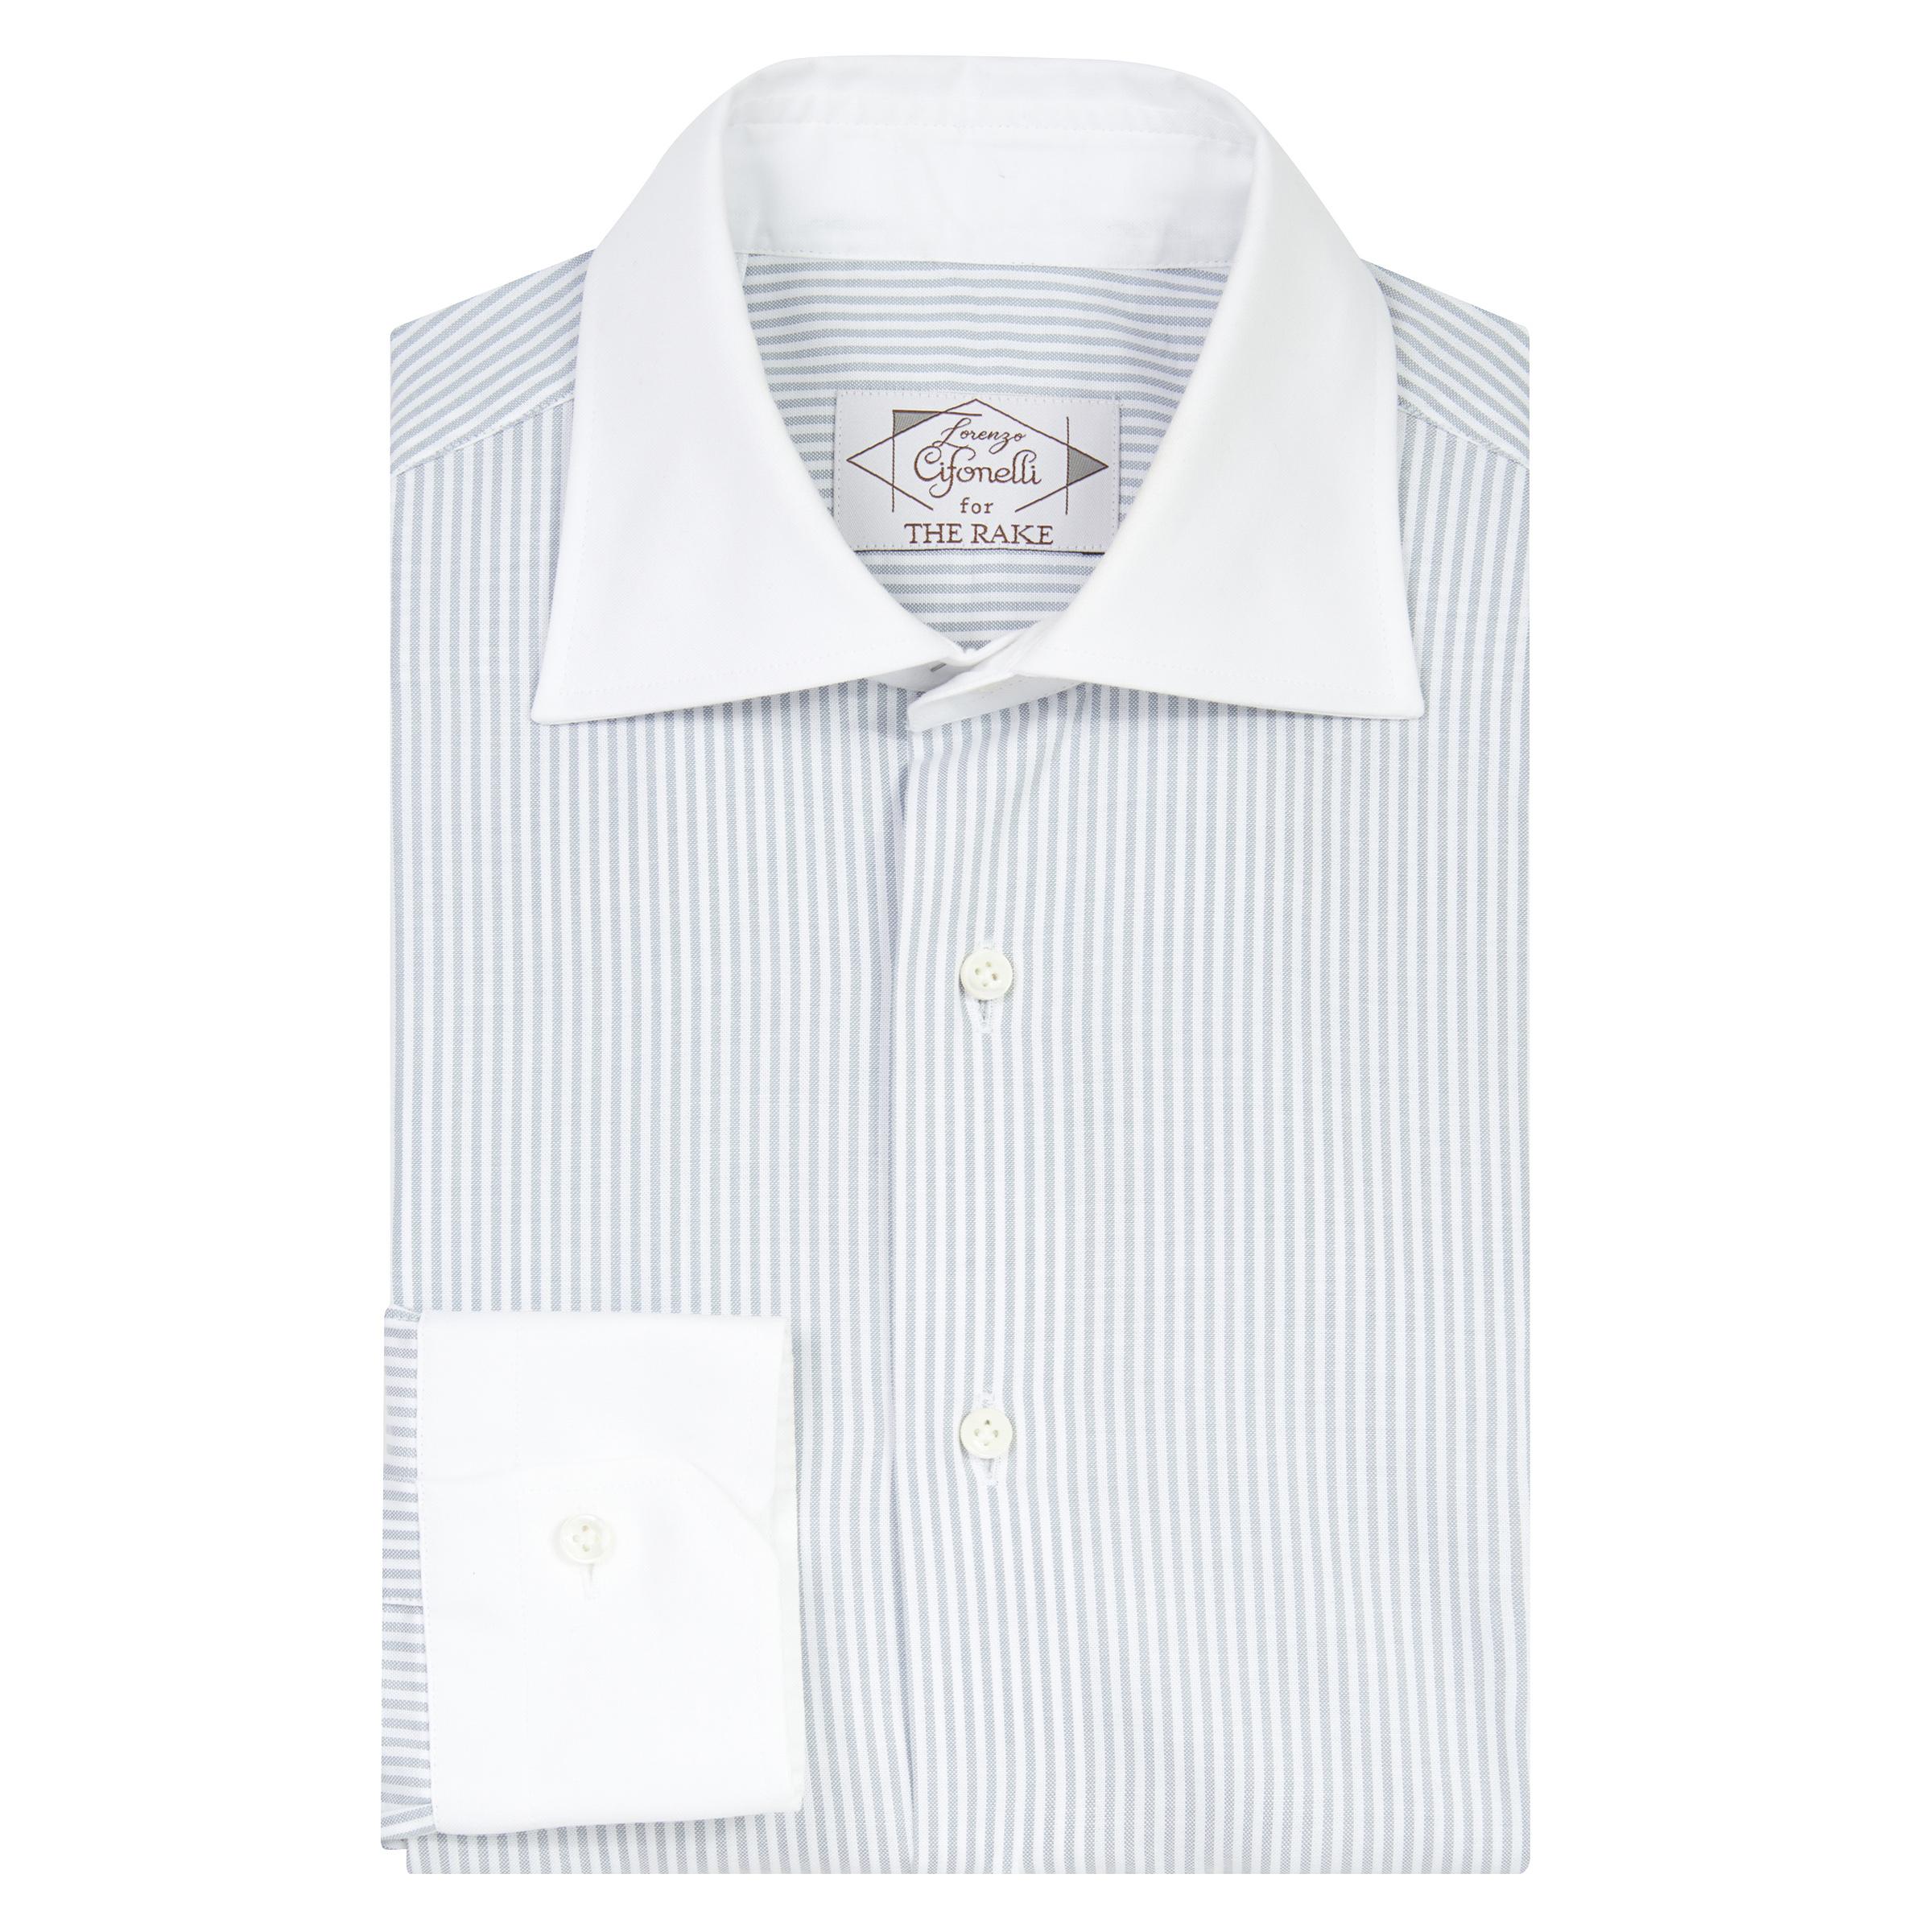 Light Grey Cotton Striped Contrast Collar Shirt